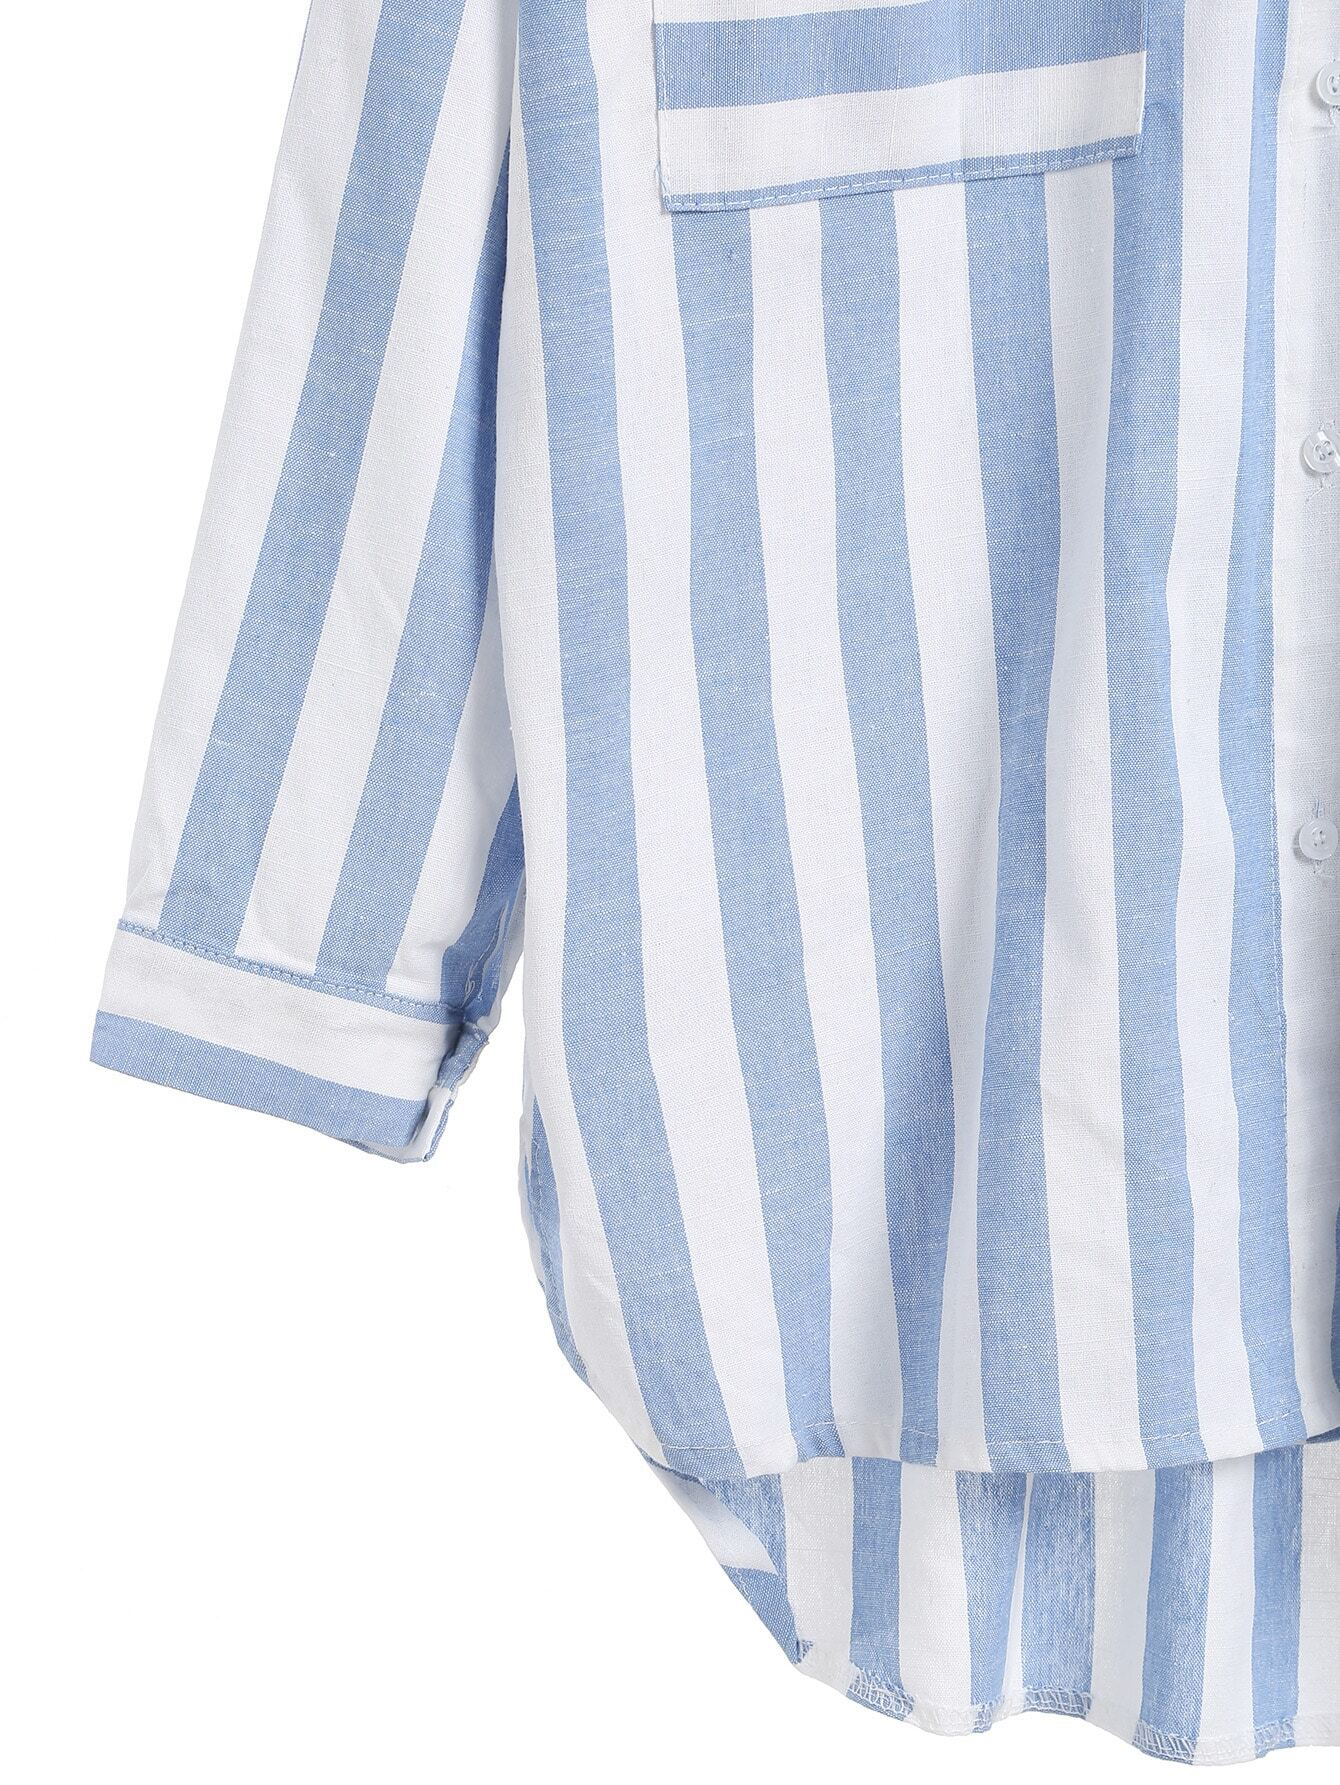 blouse160831126_2